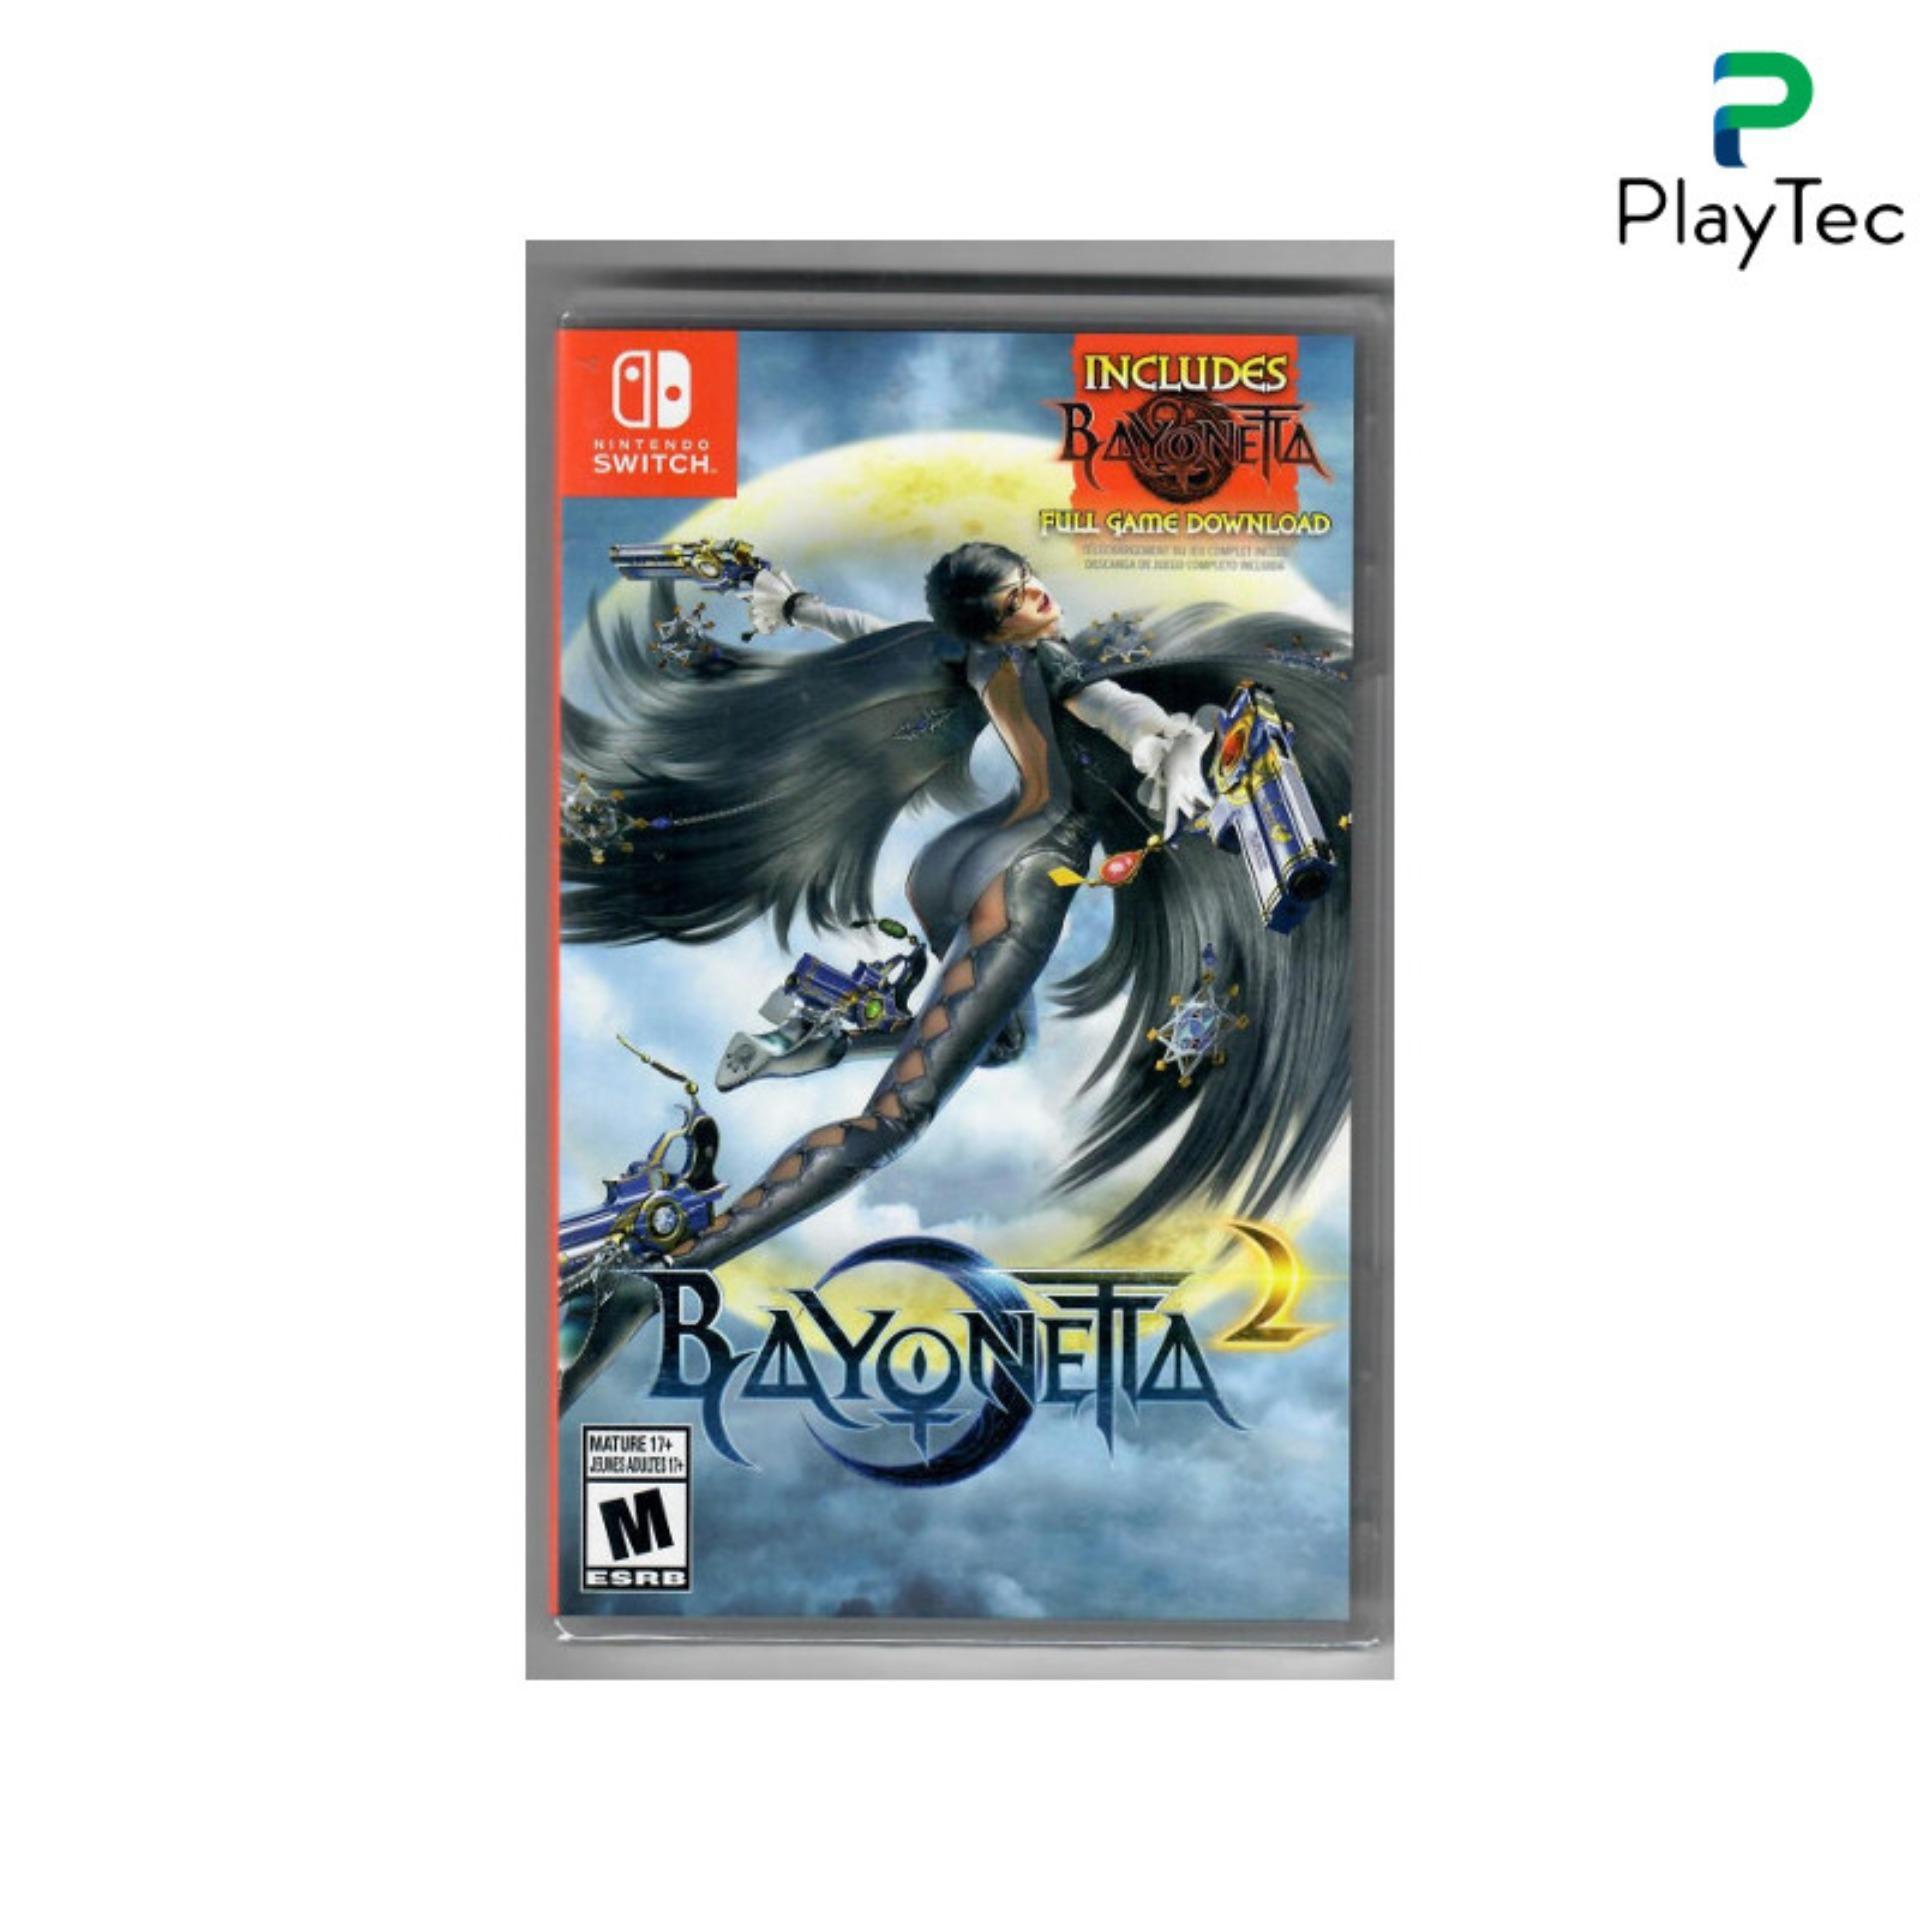 Nintendo Switch Bayonetta 2-US (R1)